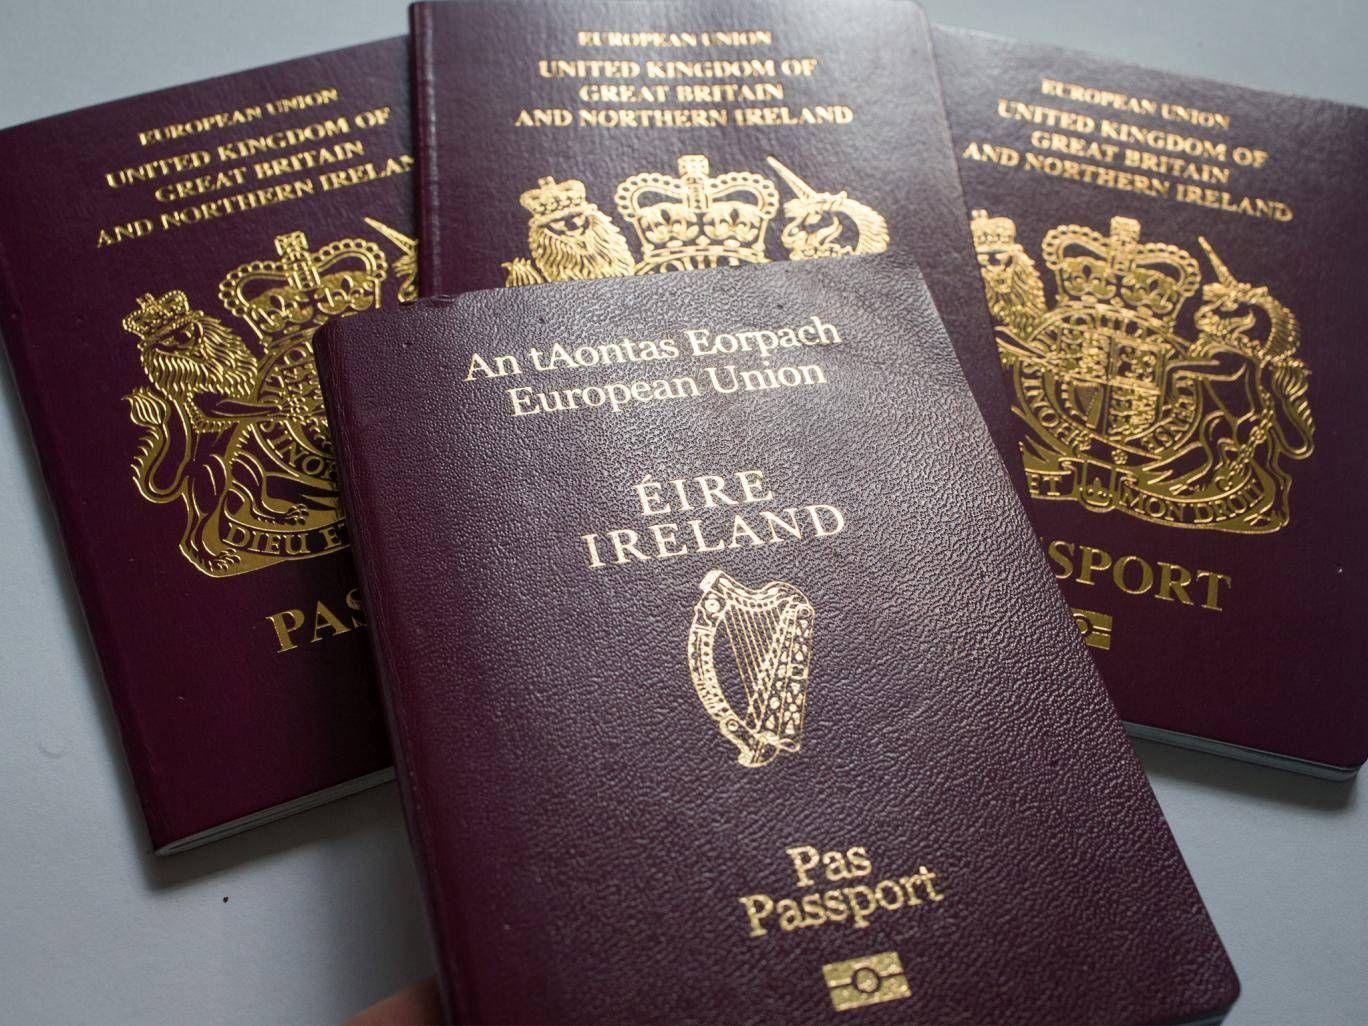 Something very predictable is happening to Irish passports